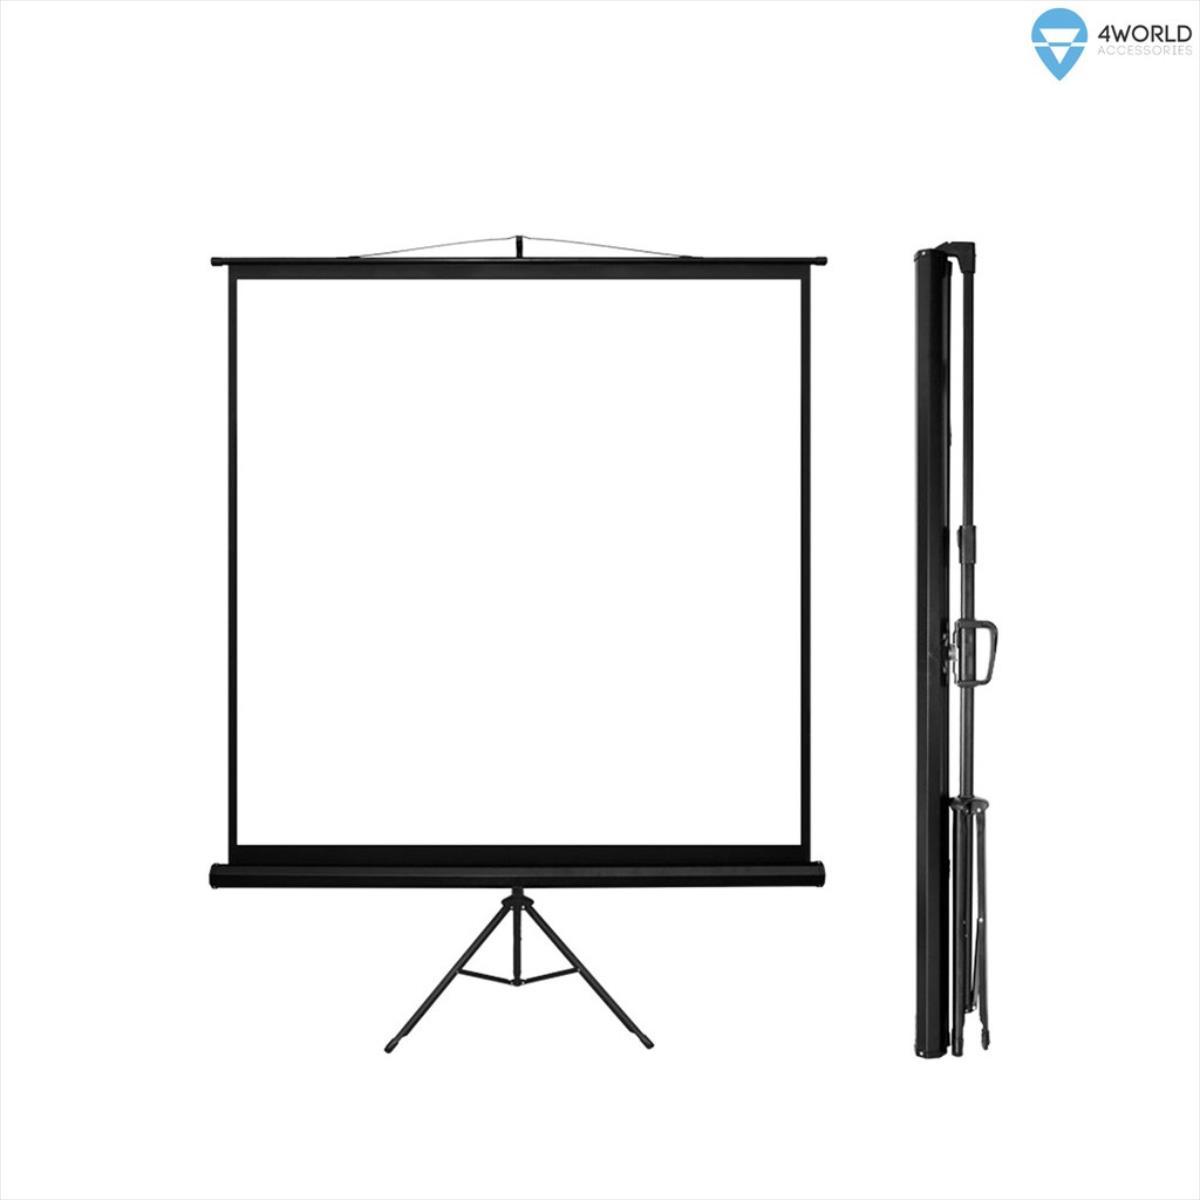 4World Projection screen with stand 178x178 (1:1) Matt White ekrāns projektoram